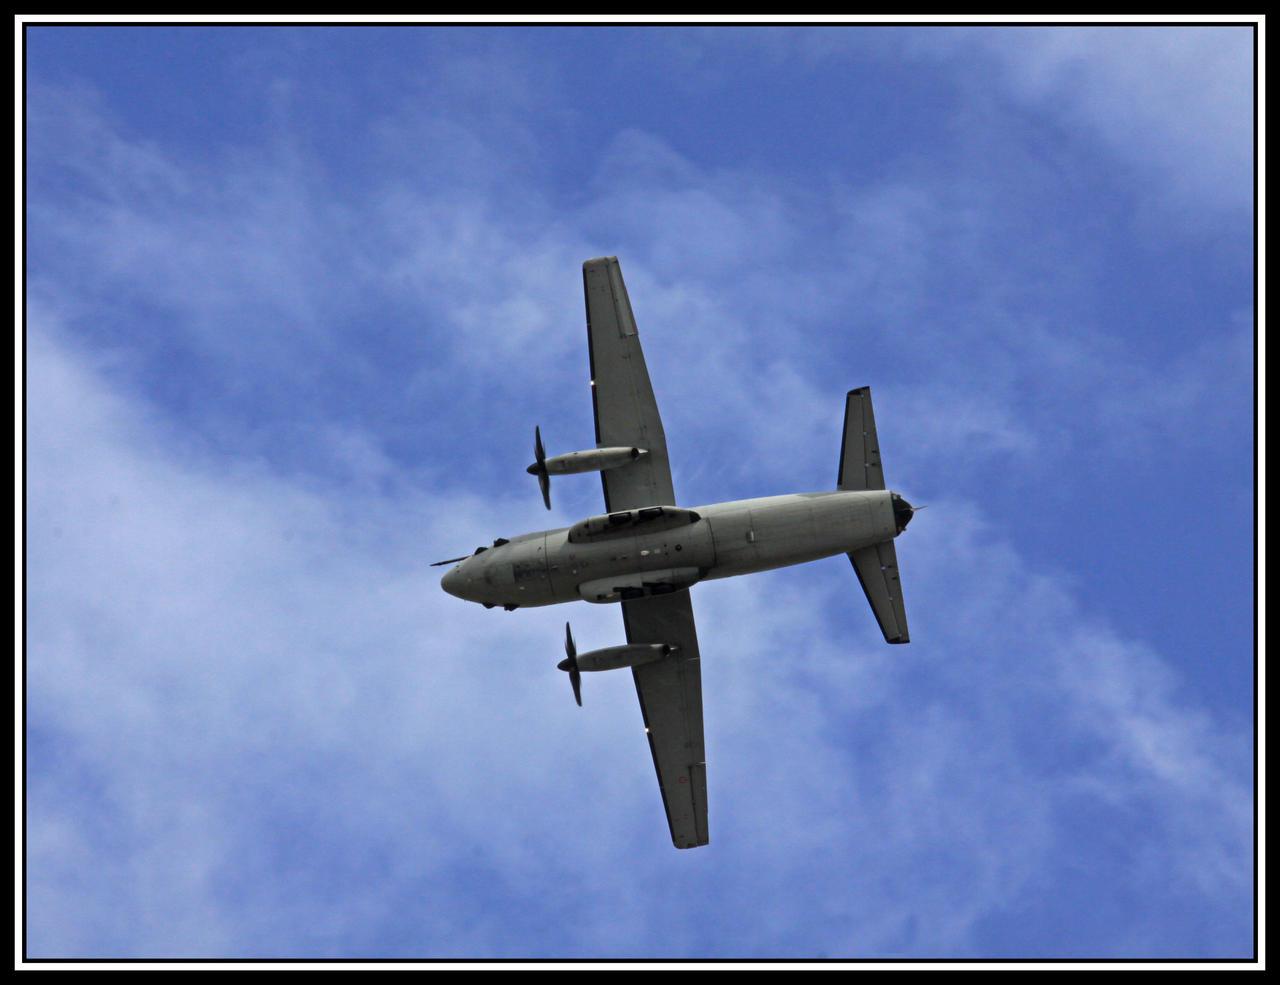 C-27J Underside by lizzyr